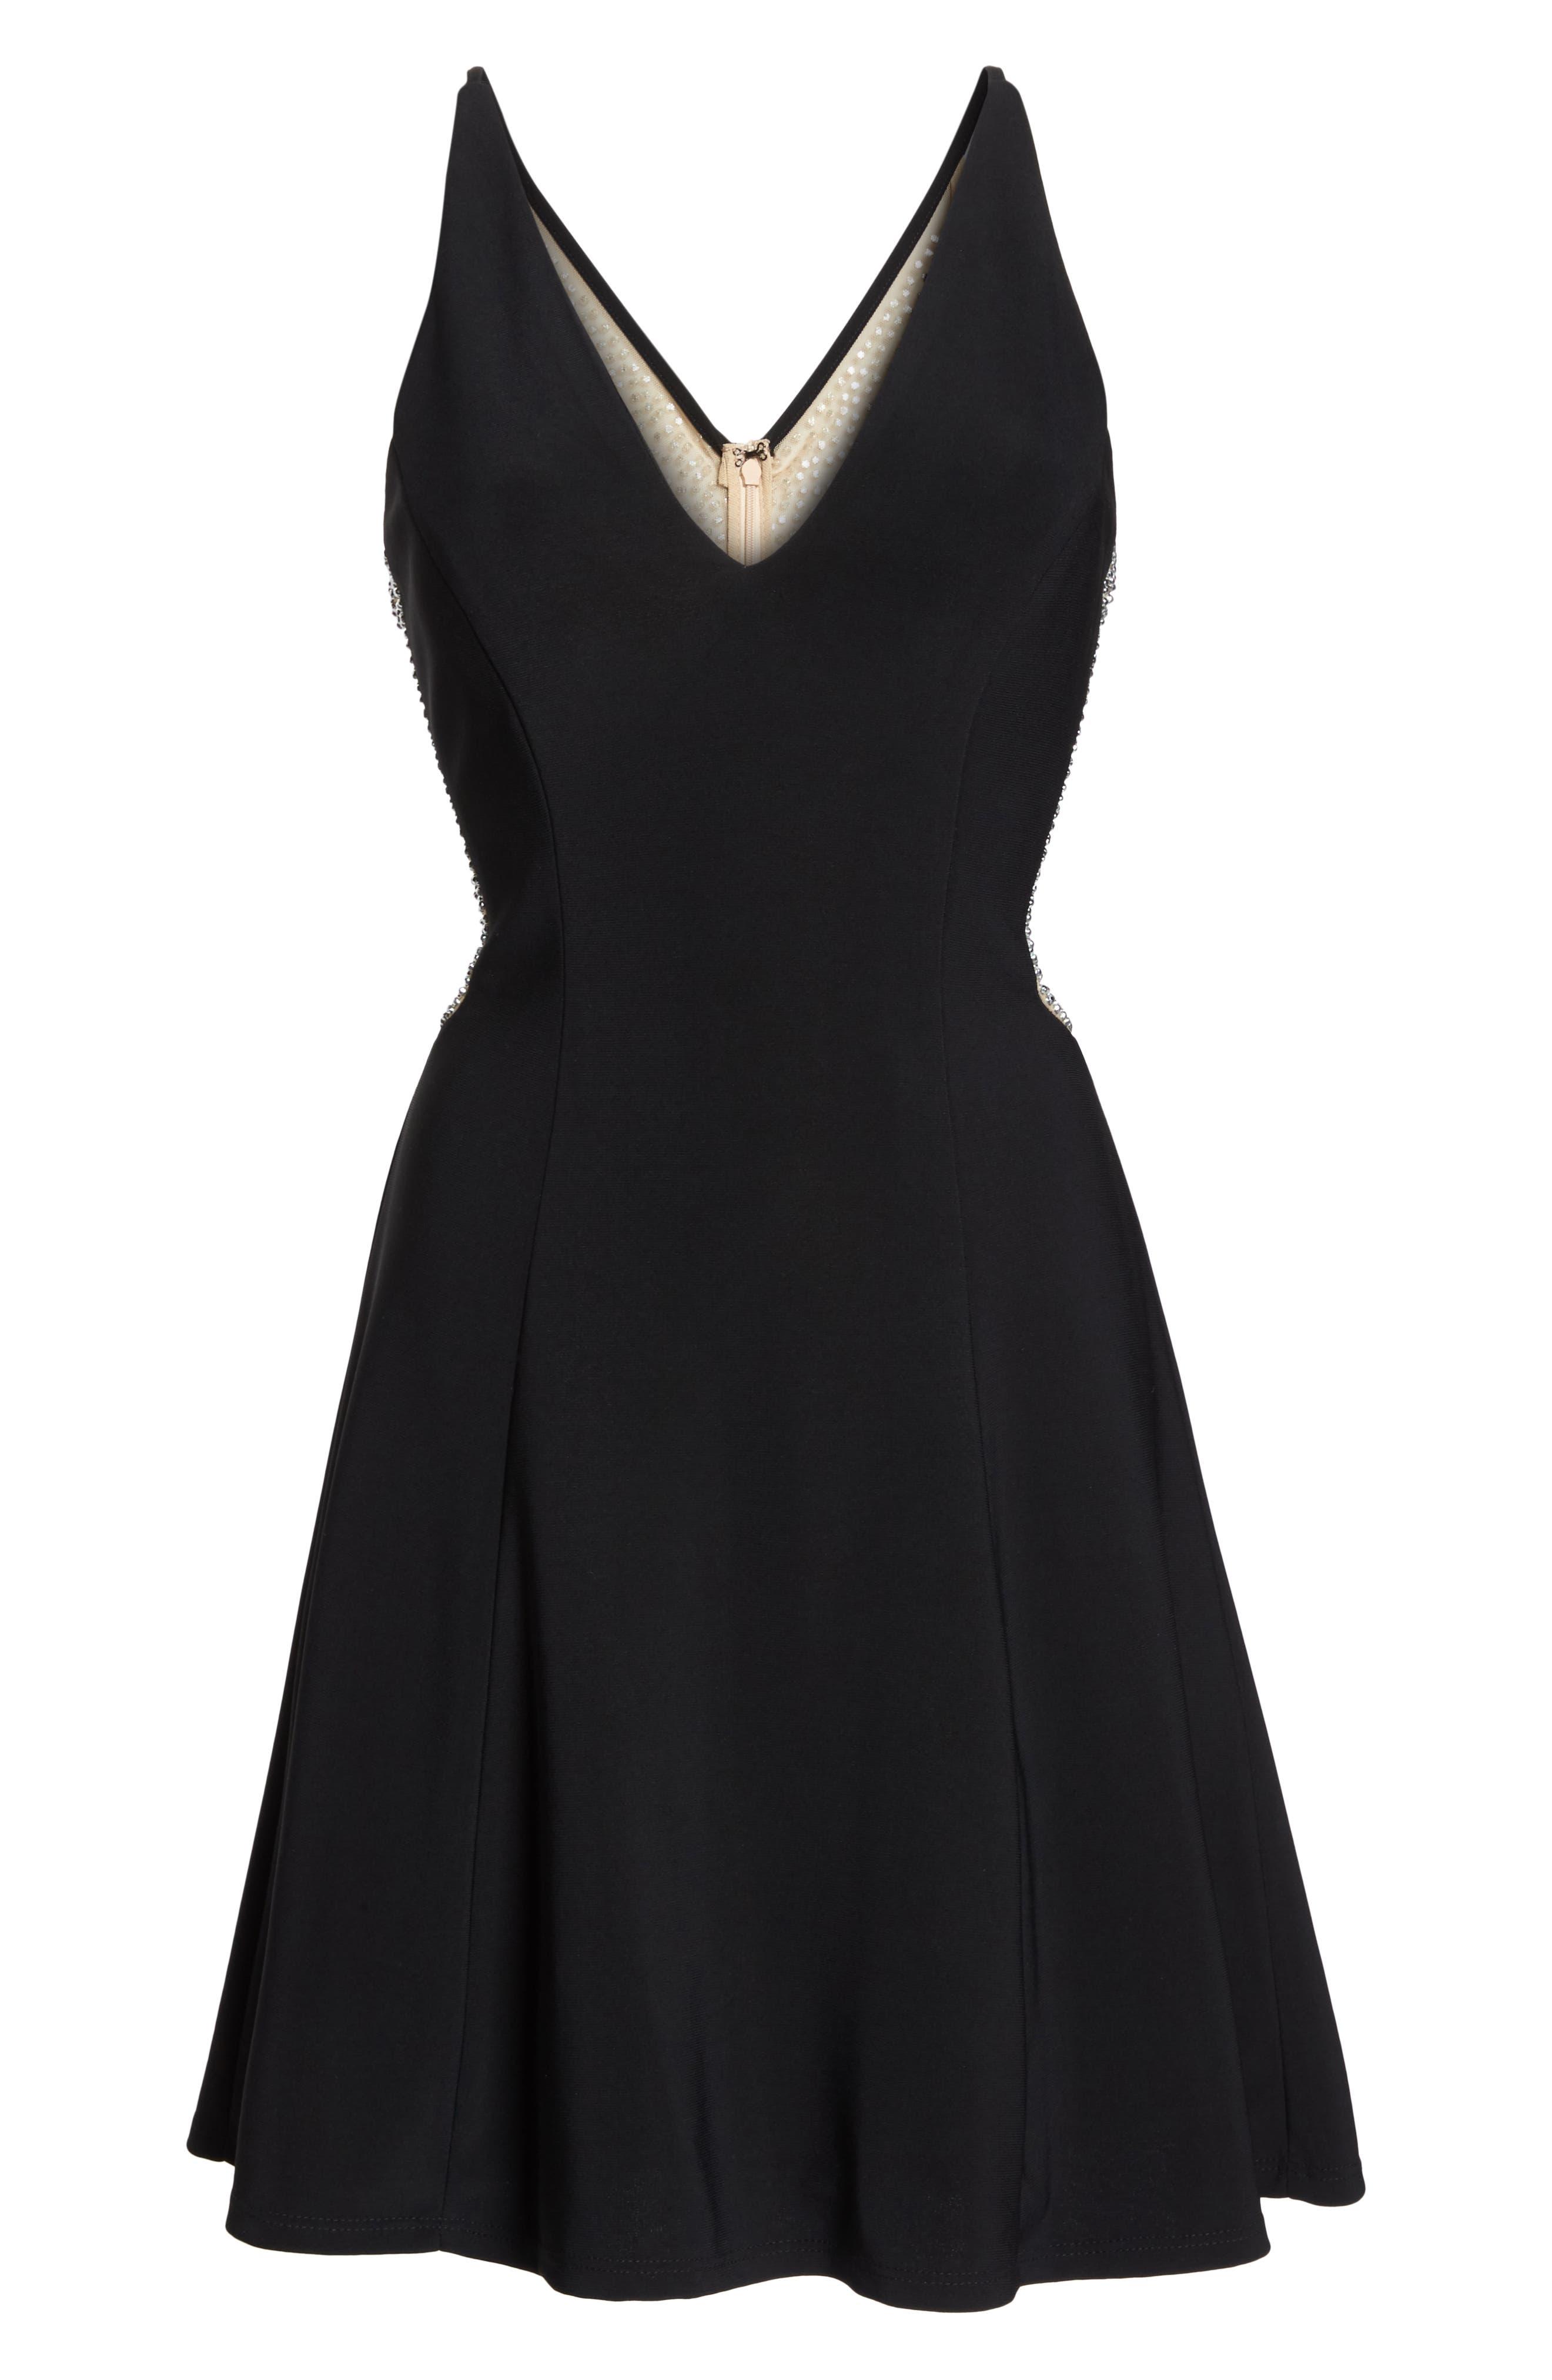 Deep V-Neck Skater Dress,                             Alternate thumbnail 7, color,                             BLACK/ / NUDE/ SILVER